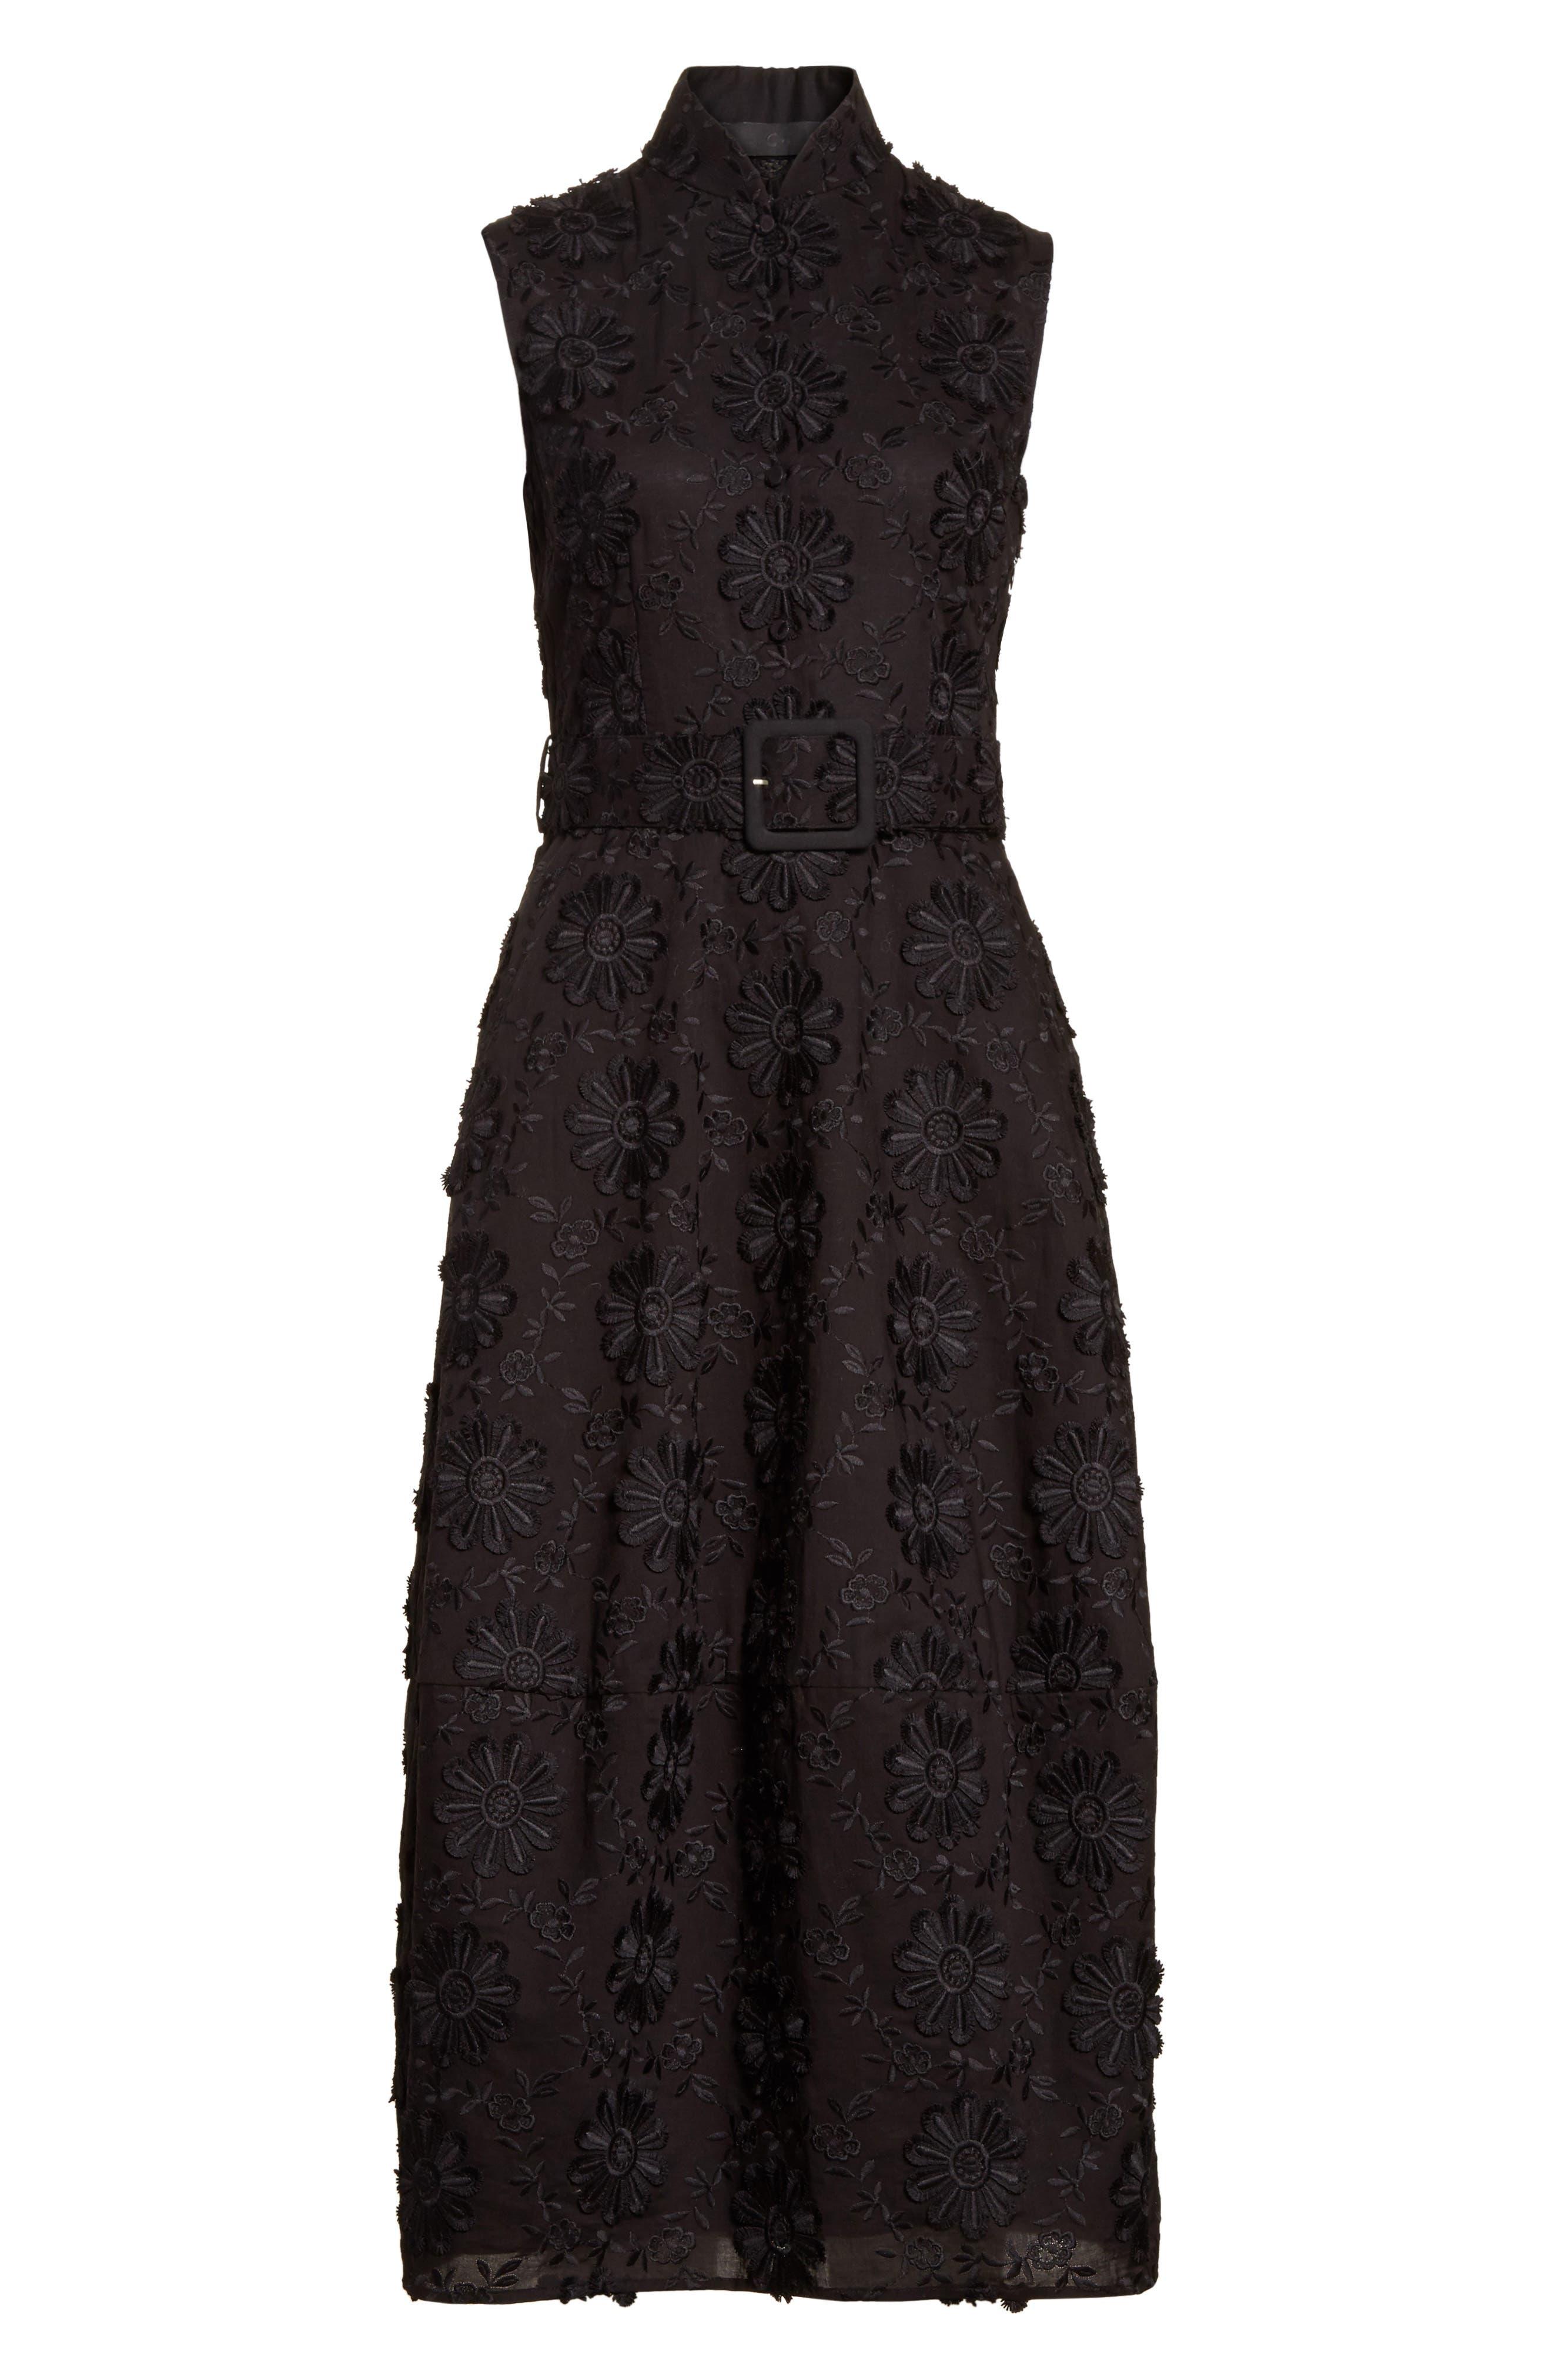 Floral Embroidered Dress,                             Alternate thumbnail 7, color,                             Black